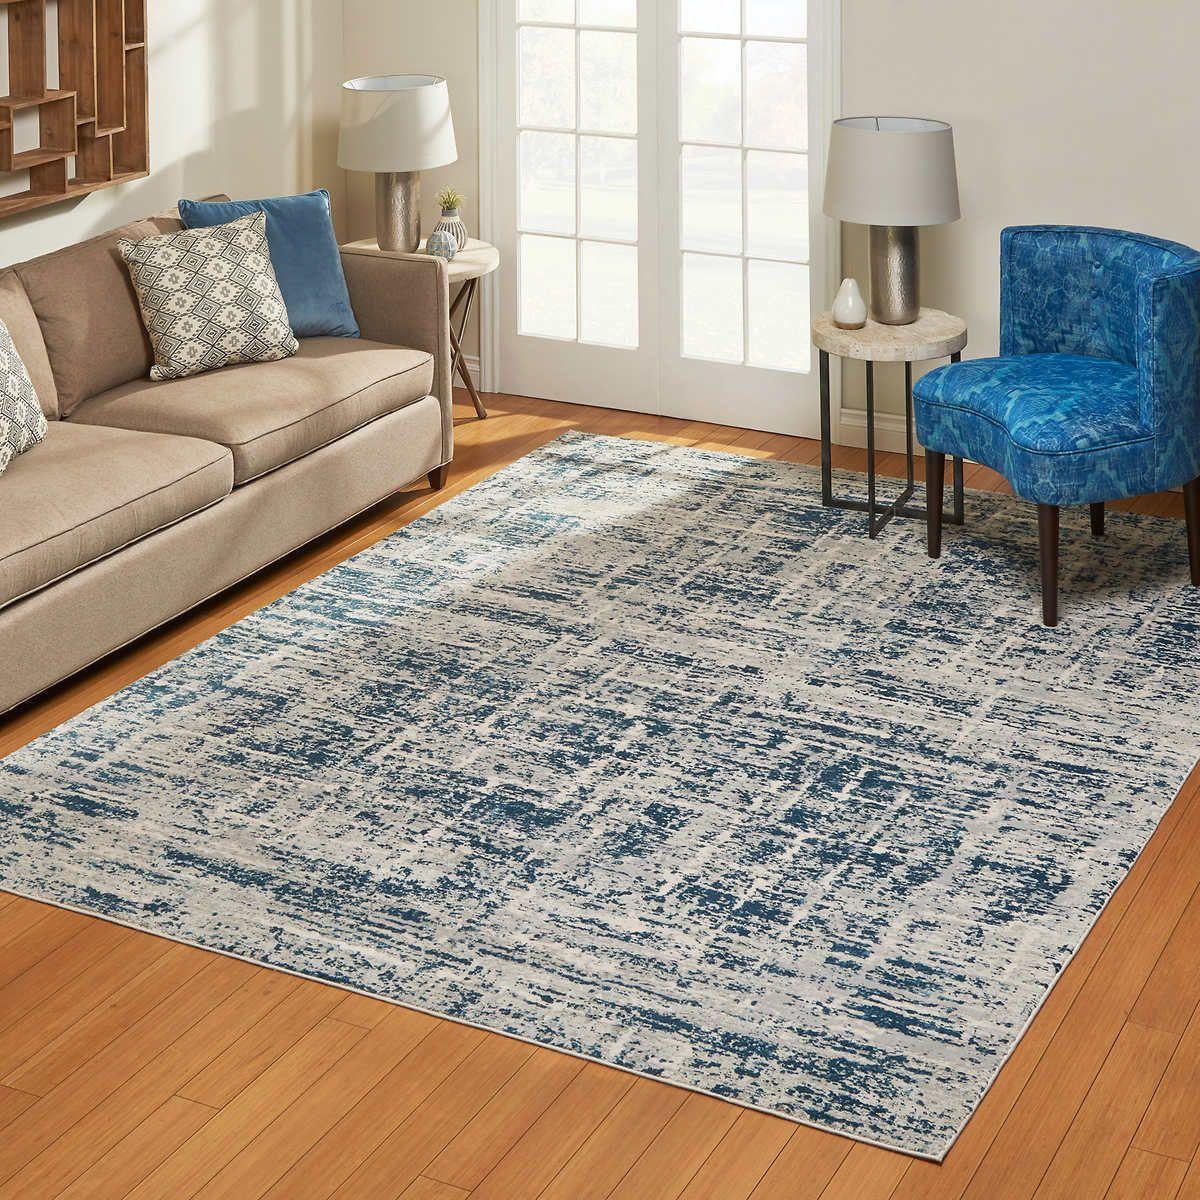 Aurora Rug Collection Joue Blue Rugs Floor Decor King Bedroom Sets